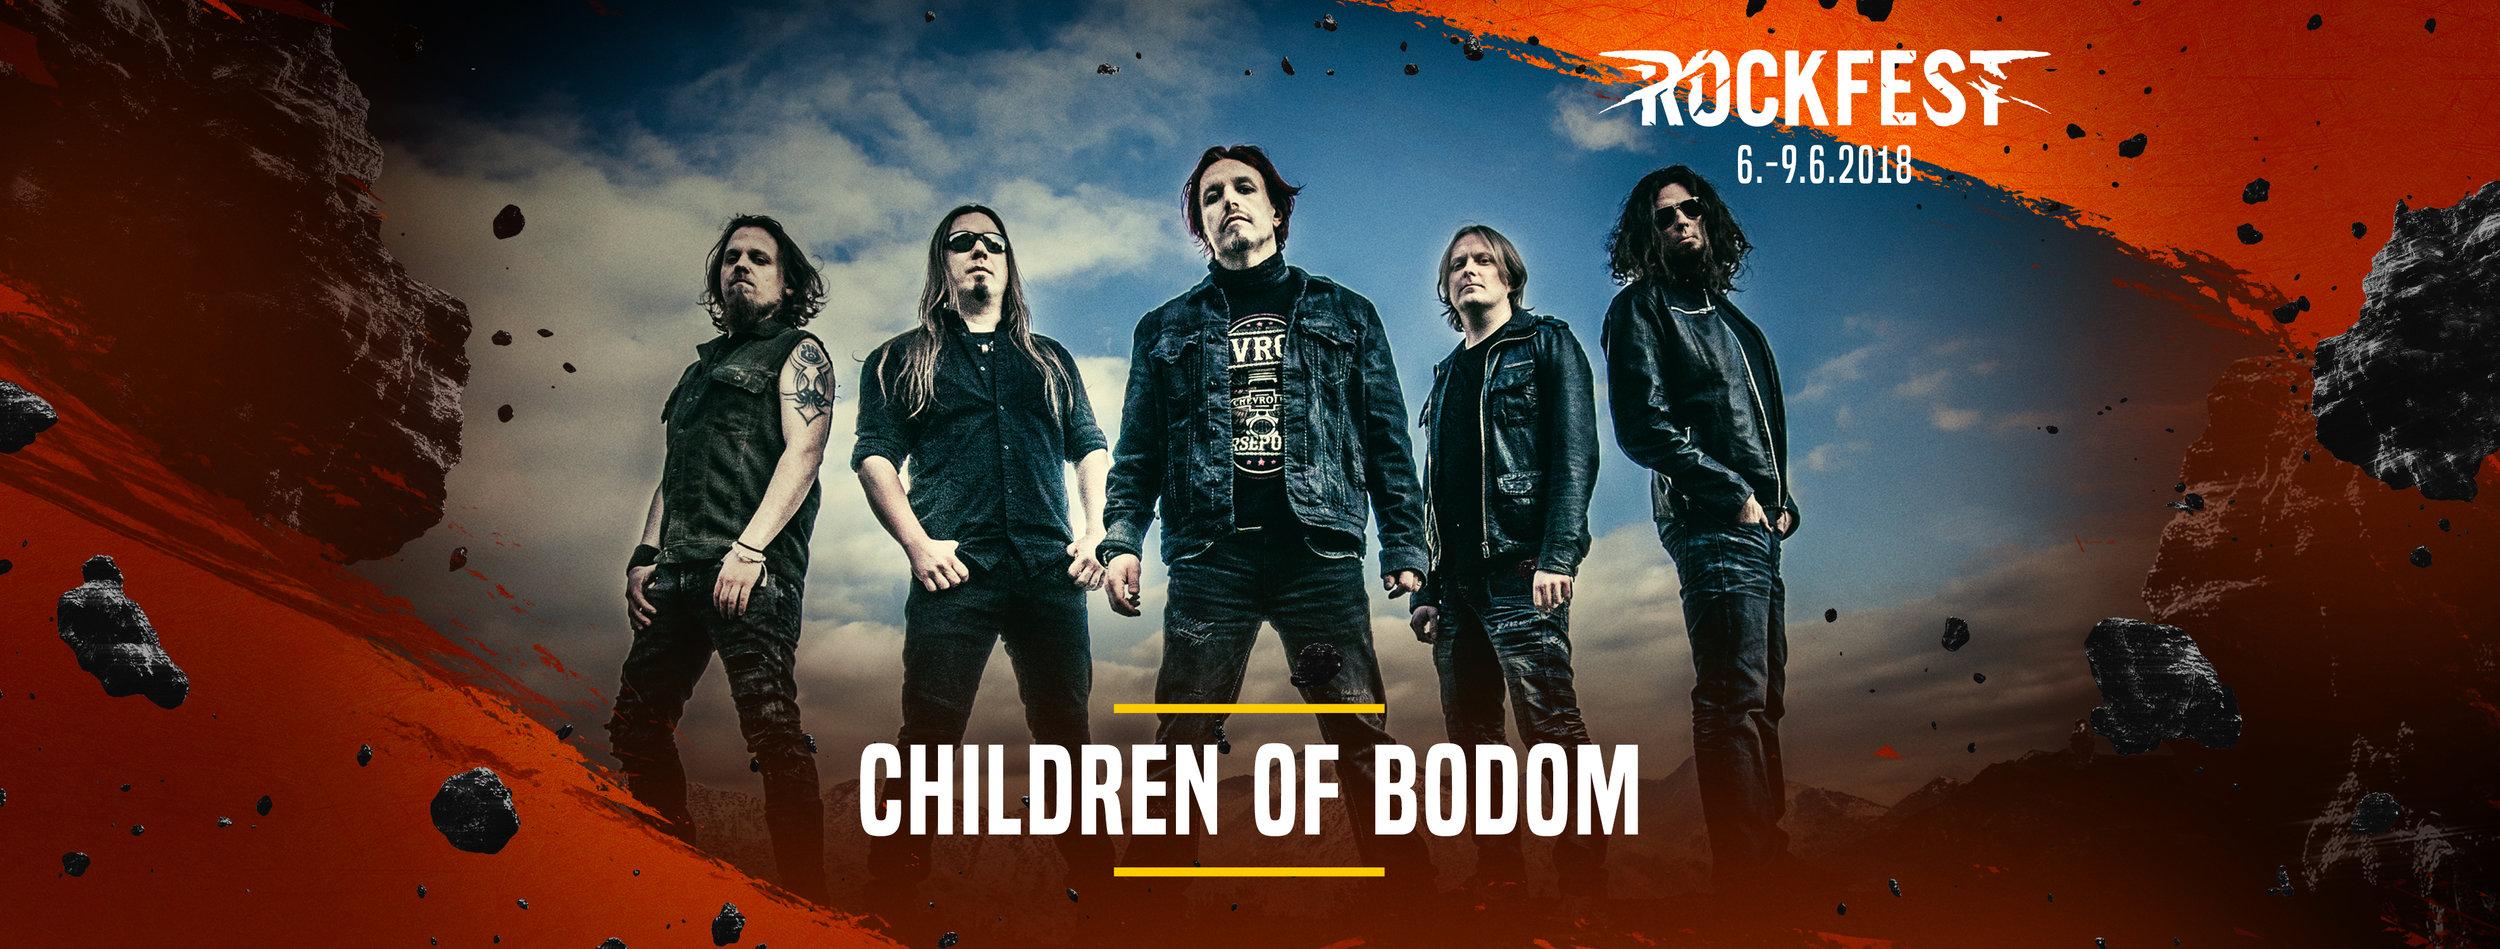 ChildrenofBodom_FB.jpg